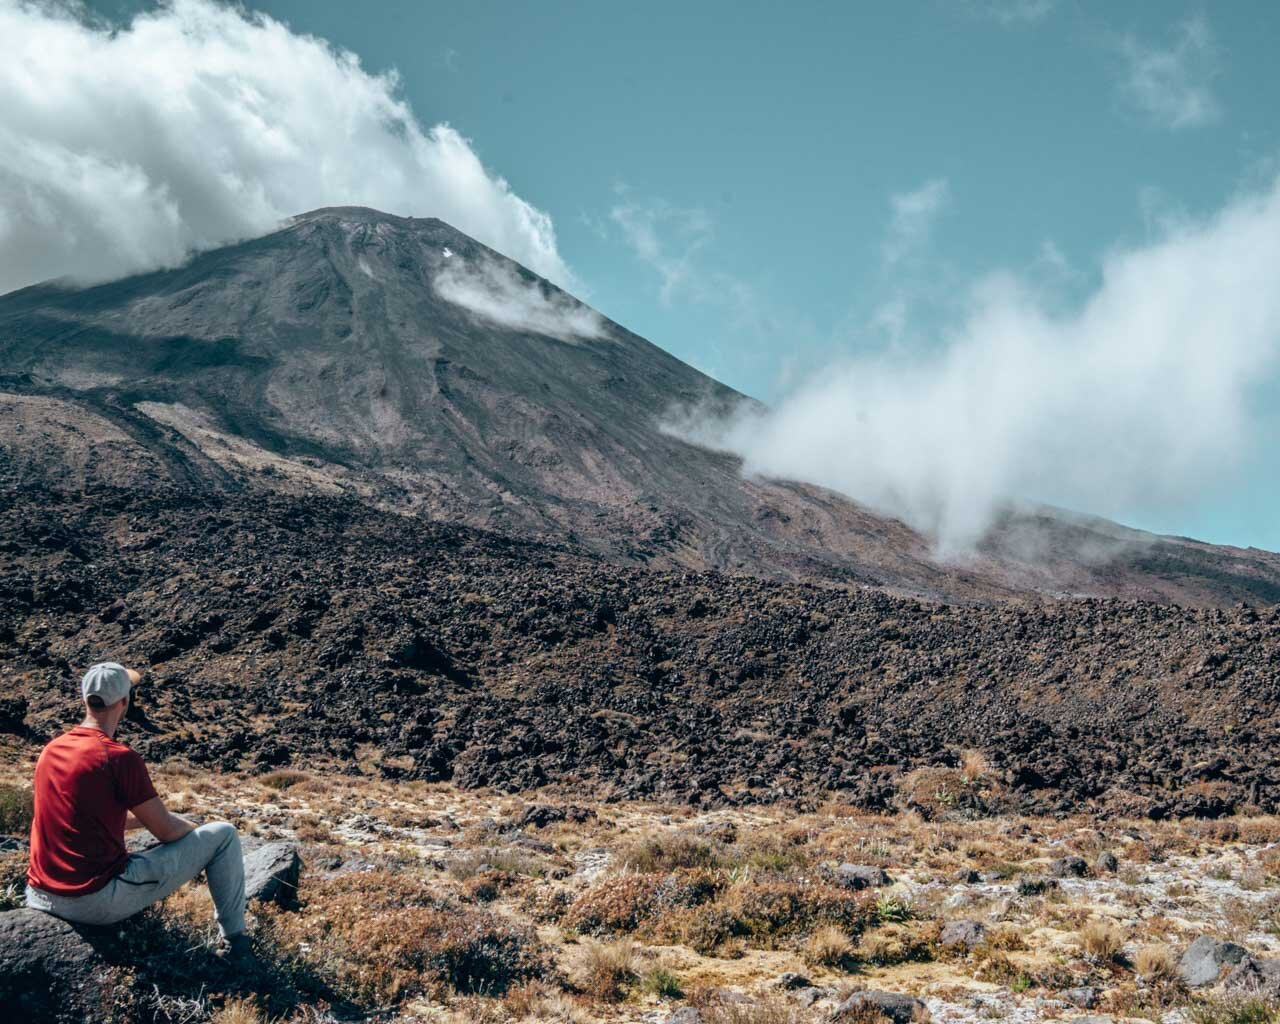 Tongariro Alpine Crossing Mount Doom Tourist traps Travel New Zealand